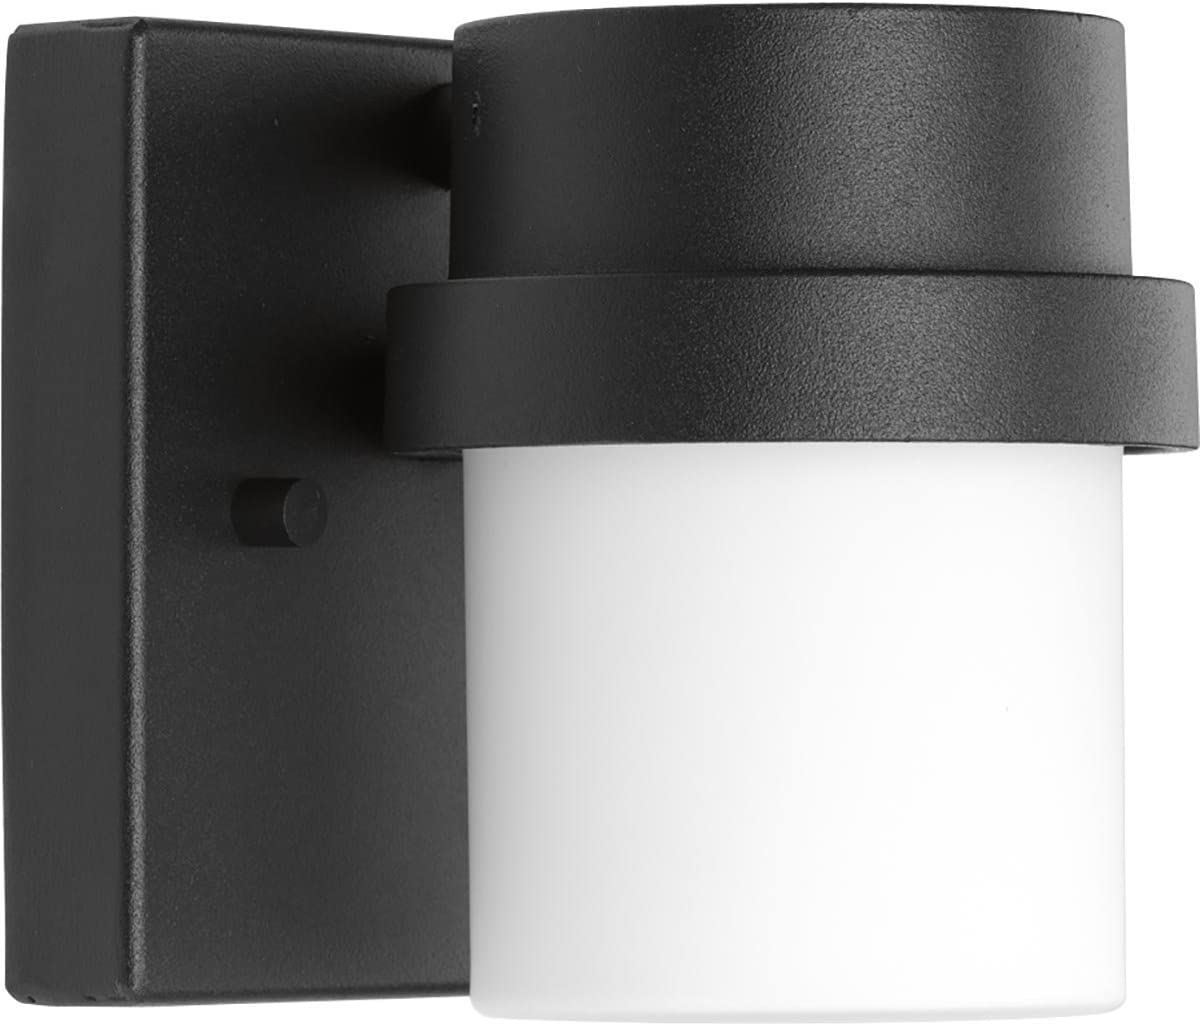 Progress Lighting P560072-031-30 Z-1060 Wall Lantern, Black